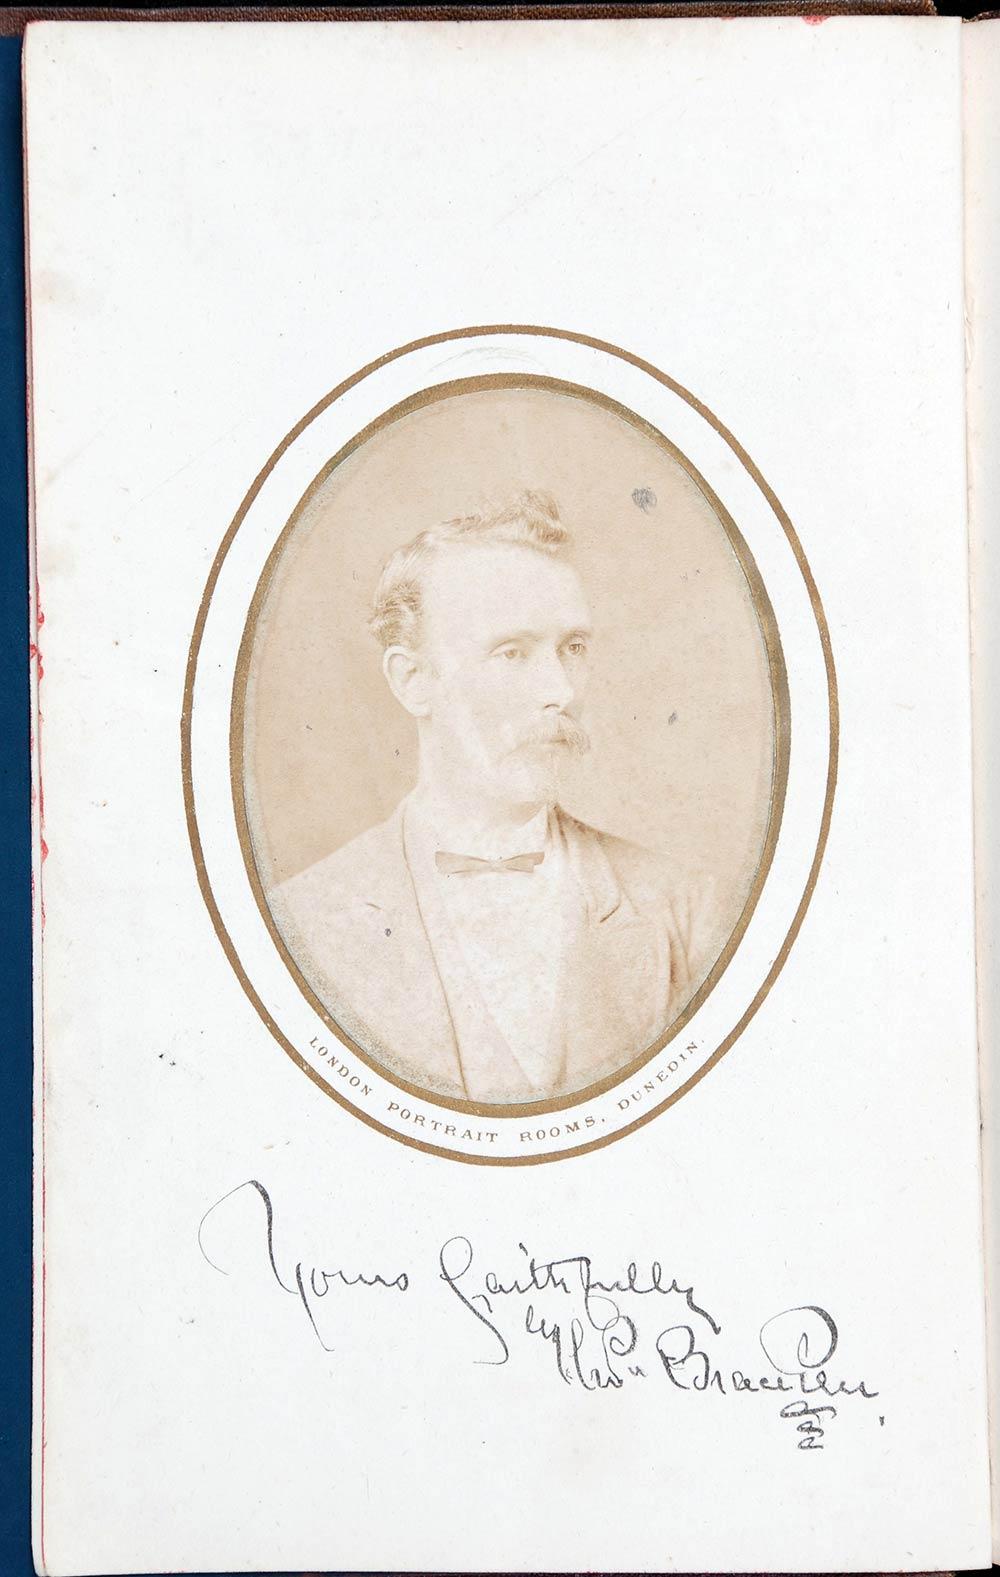 Thomas Bracken. <em>Flowers of the free lands</em>. Dunedin: Mills, Dick & Co., 1877.